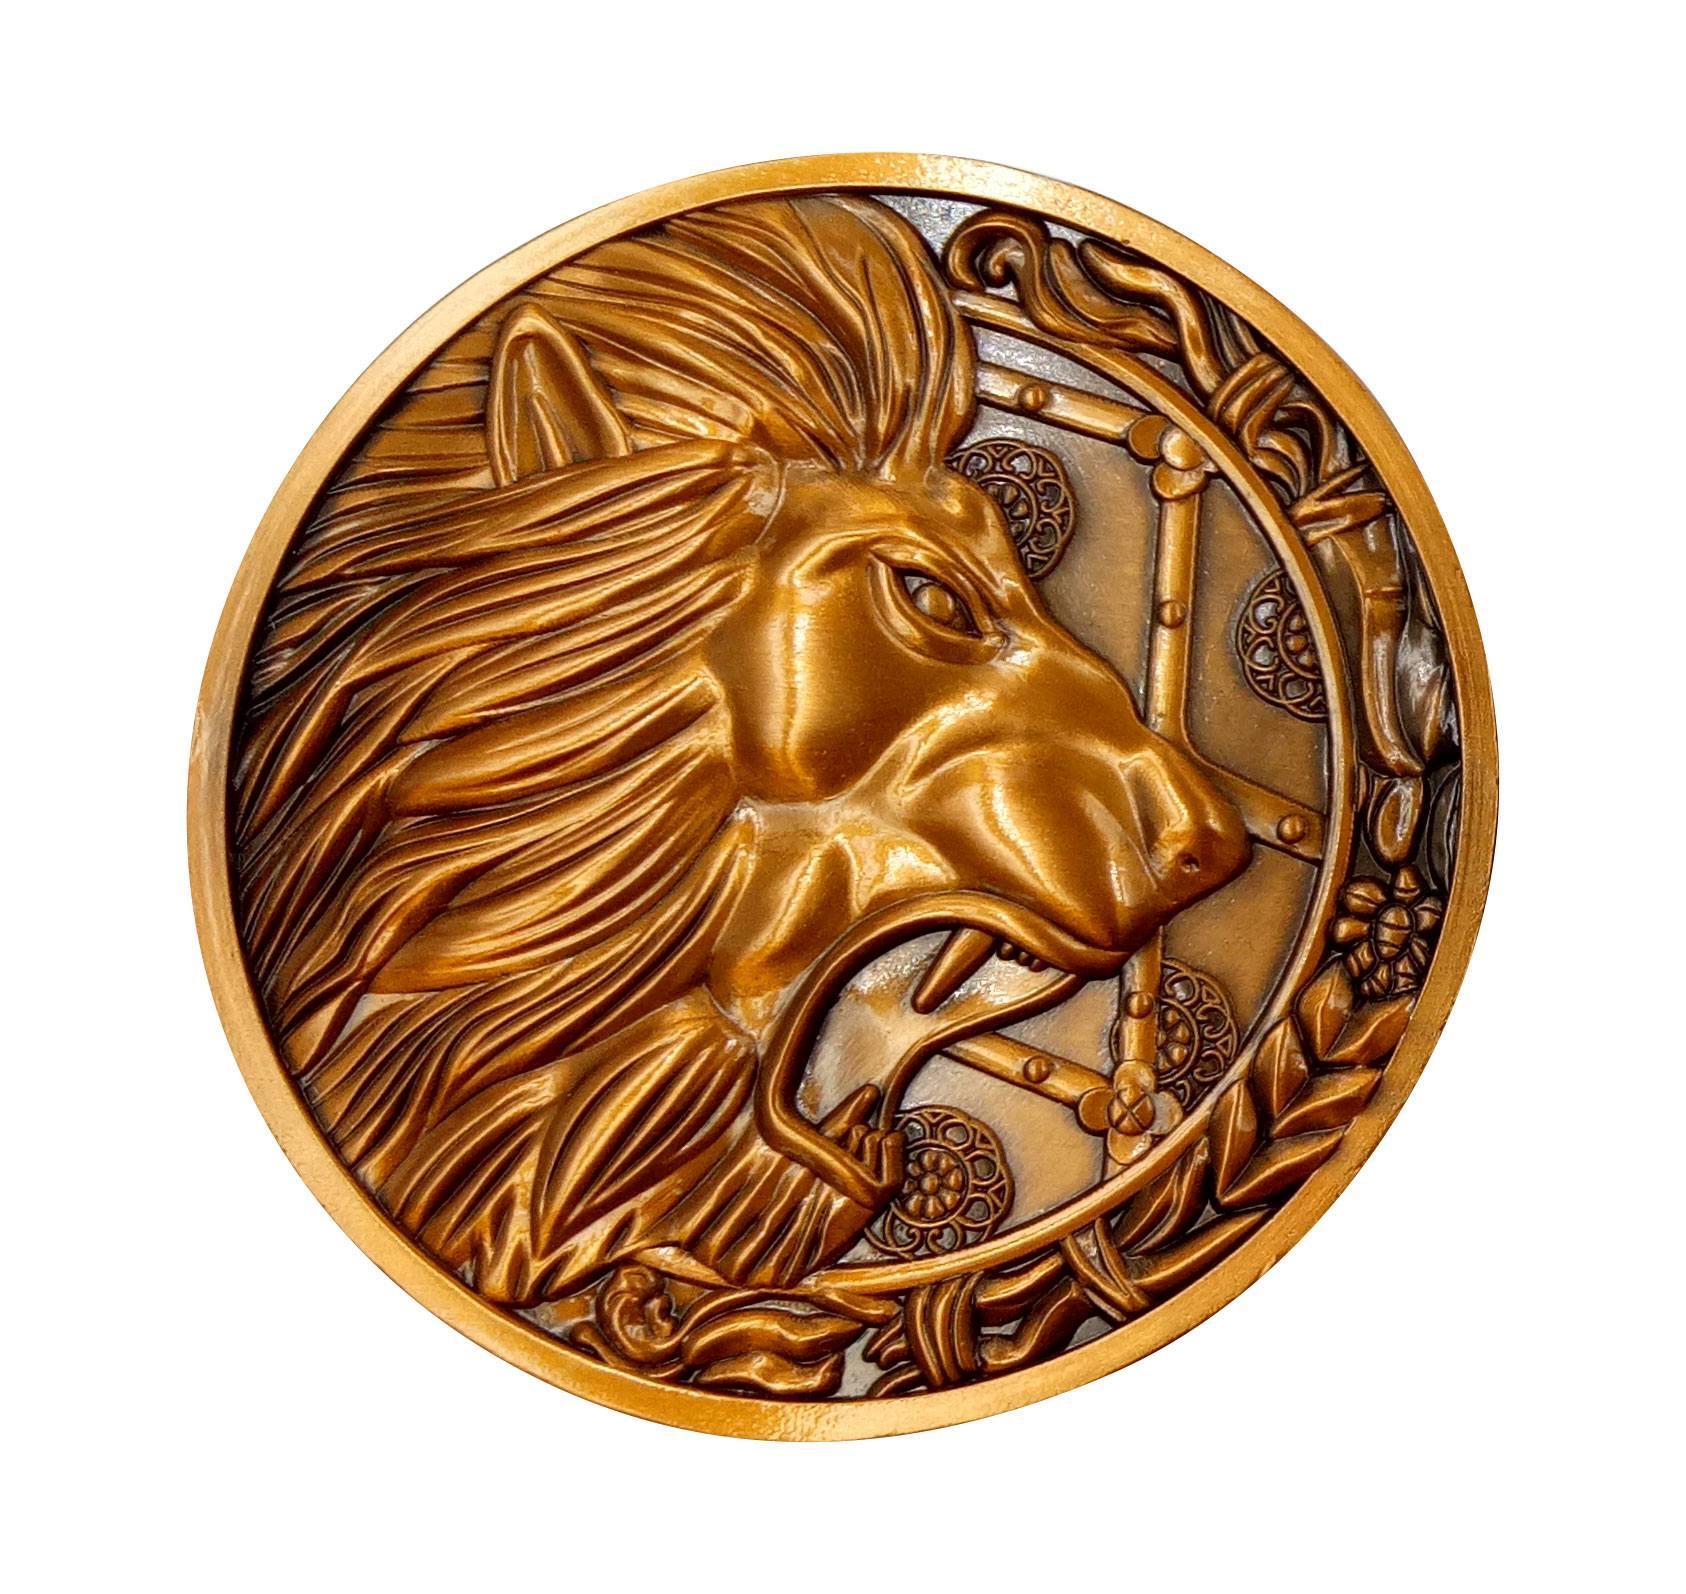 Resident evil 2 replique 11 medaillon lion 1